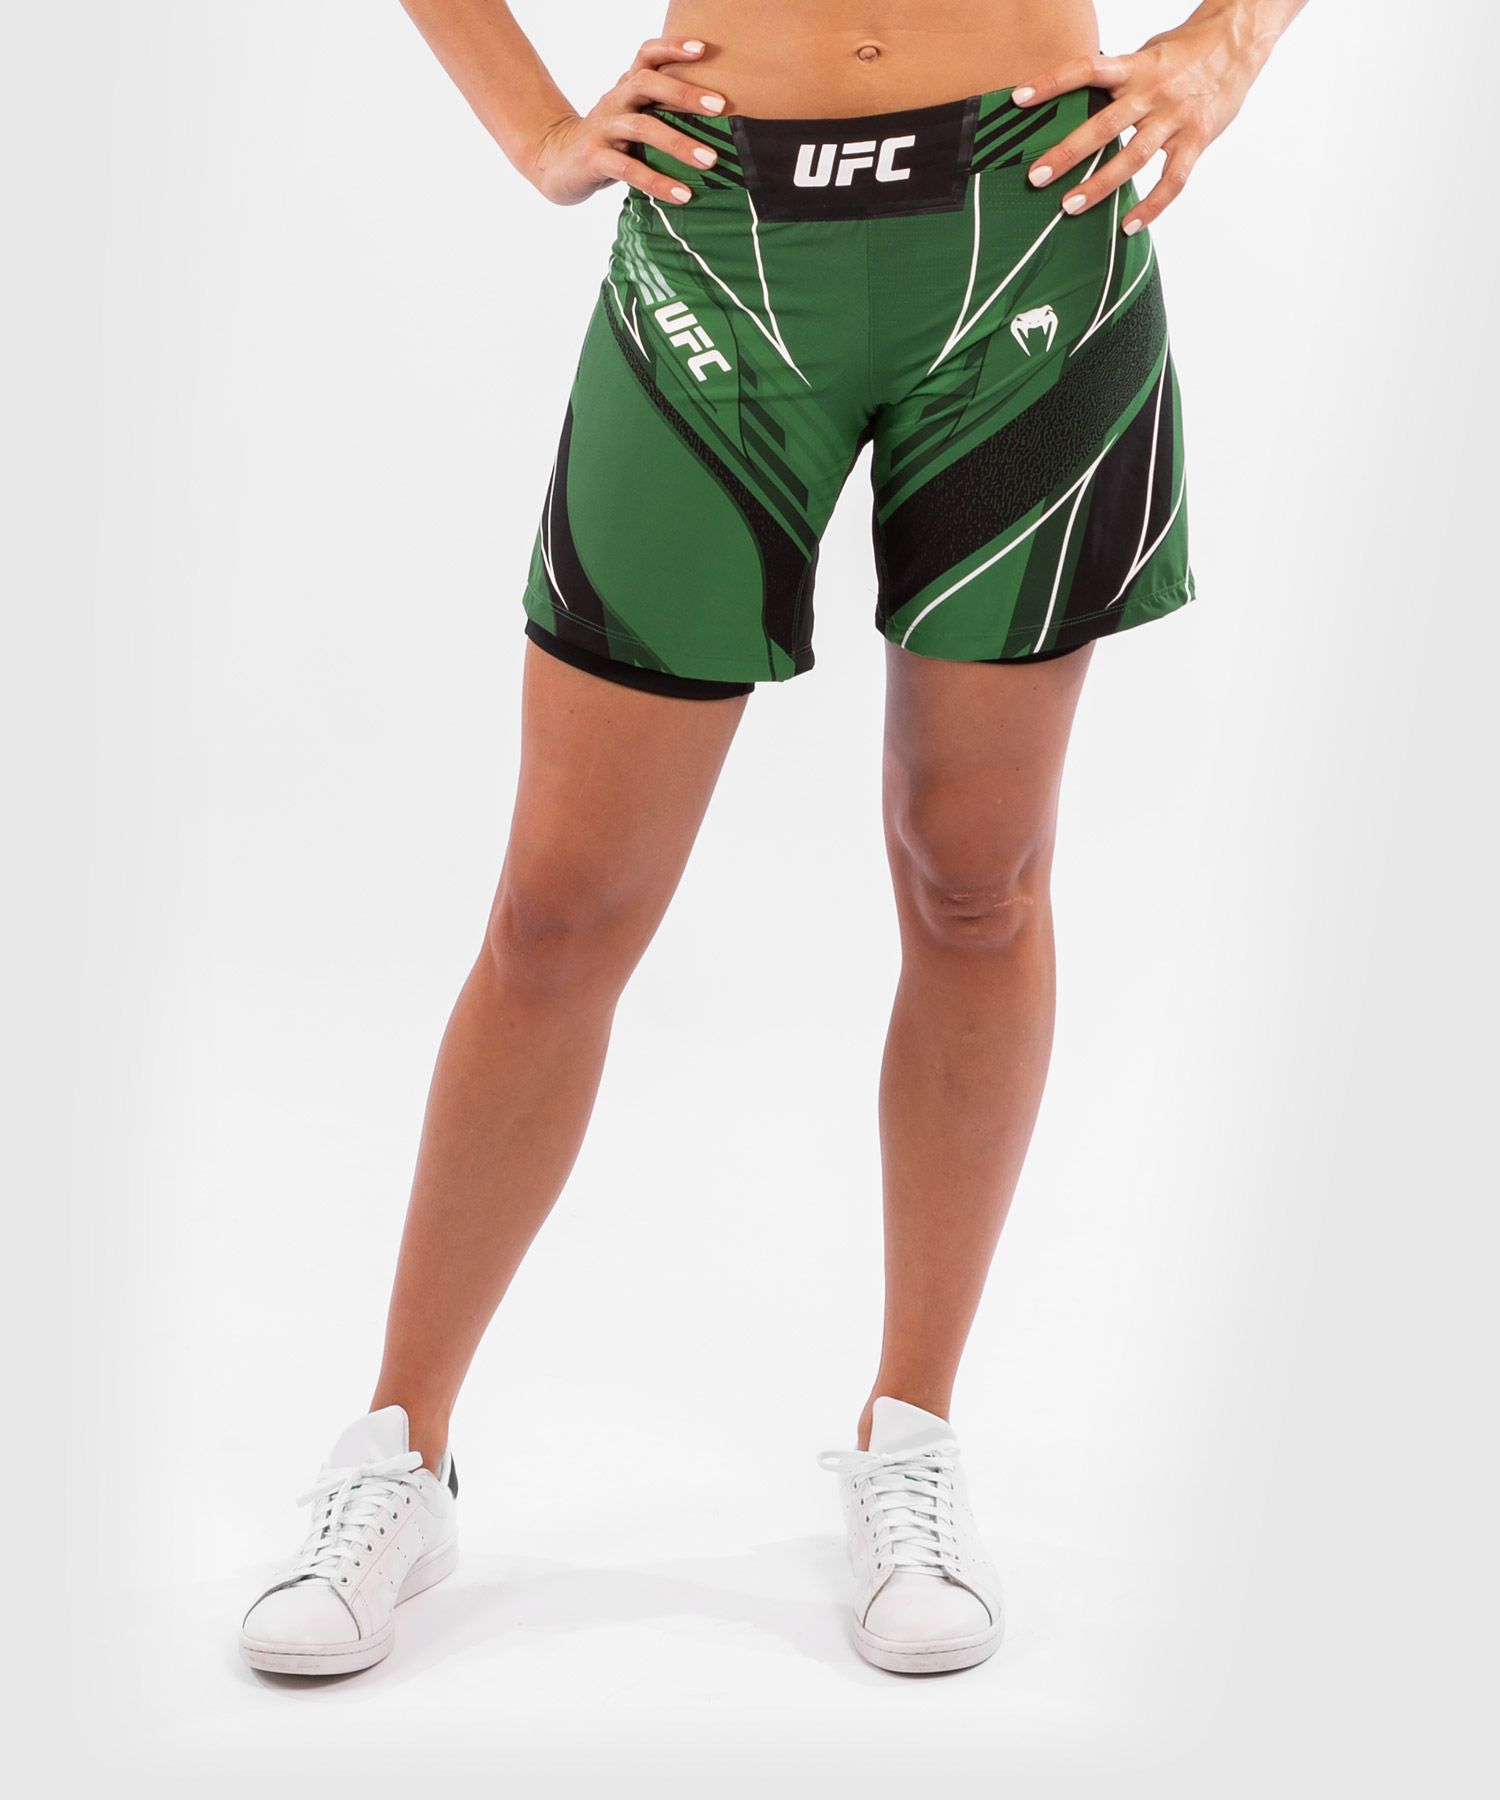 UFC 베넘 어쎈틱 파이트 나이트 여성 쇼츠 - 롱 핏 - 초록